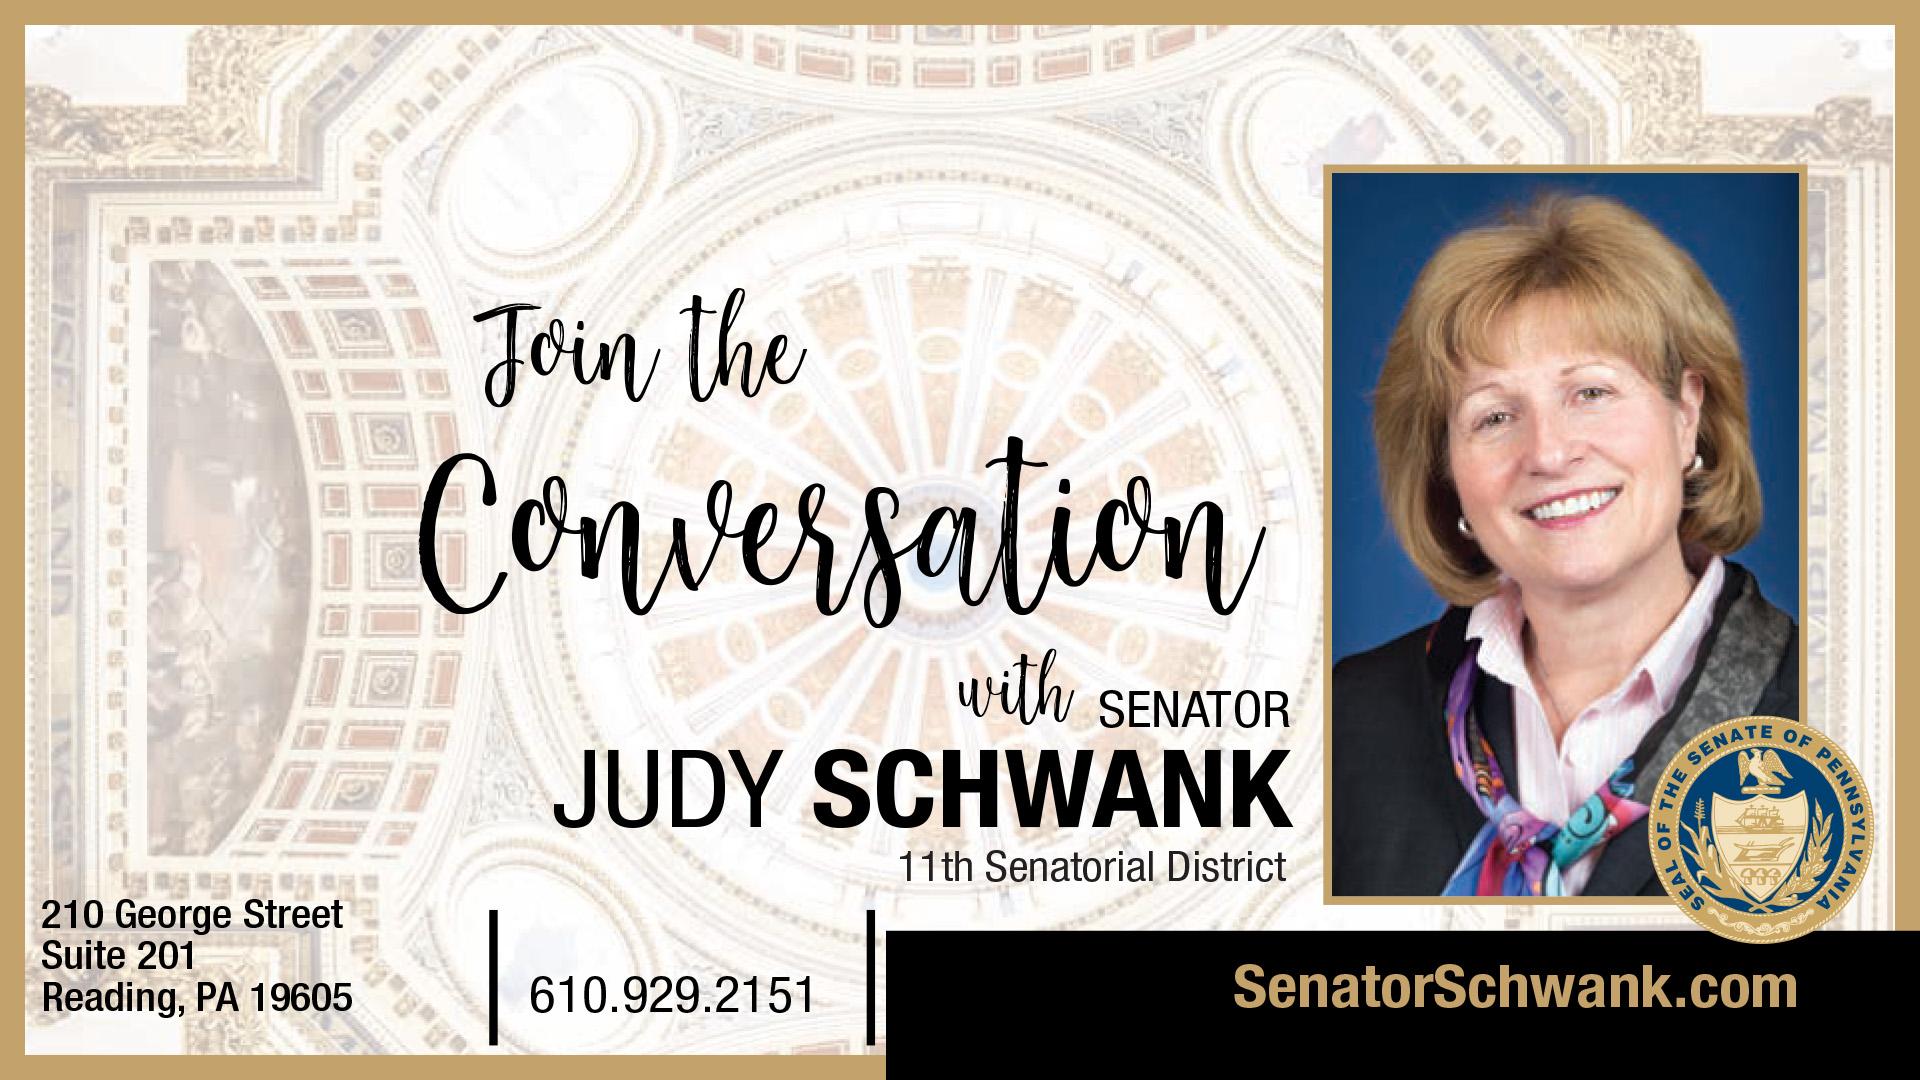 Pennsylvania State Senator Judy Schwank